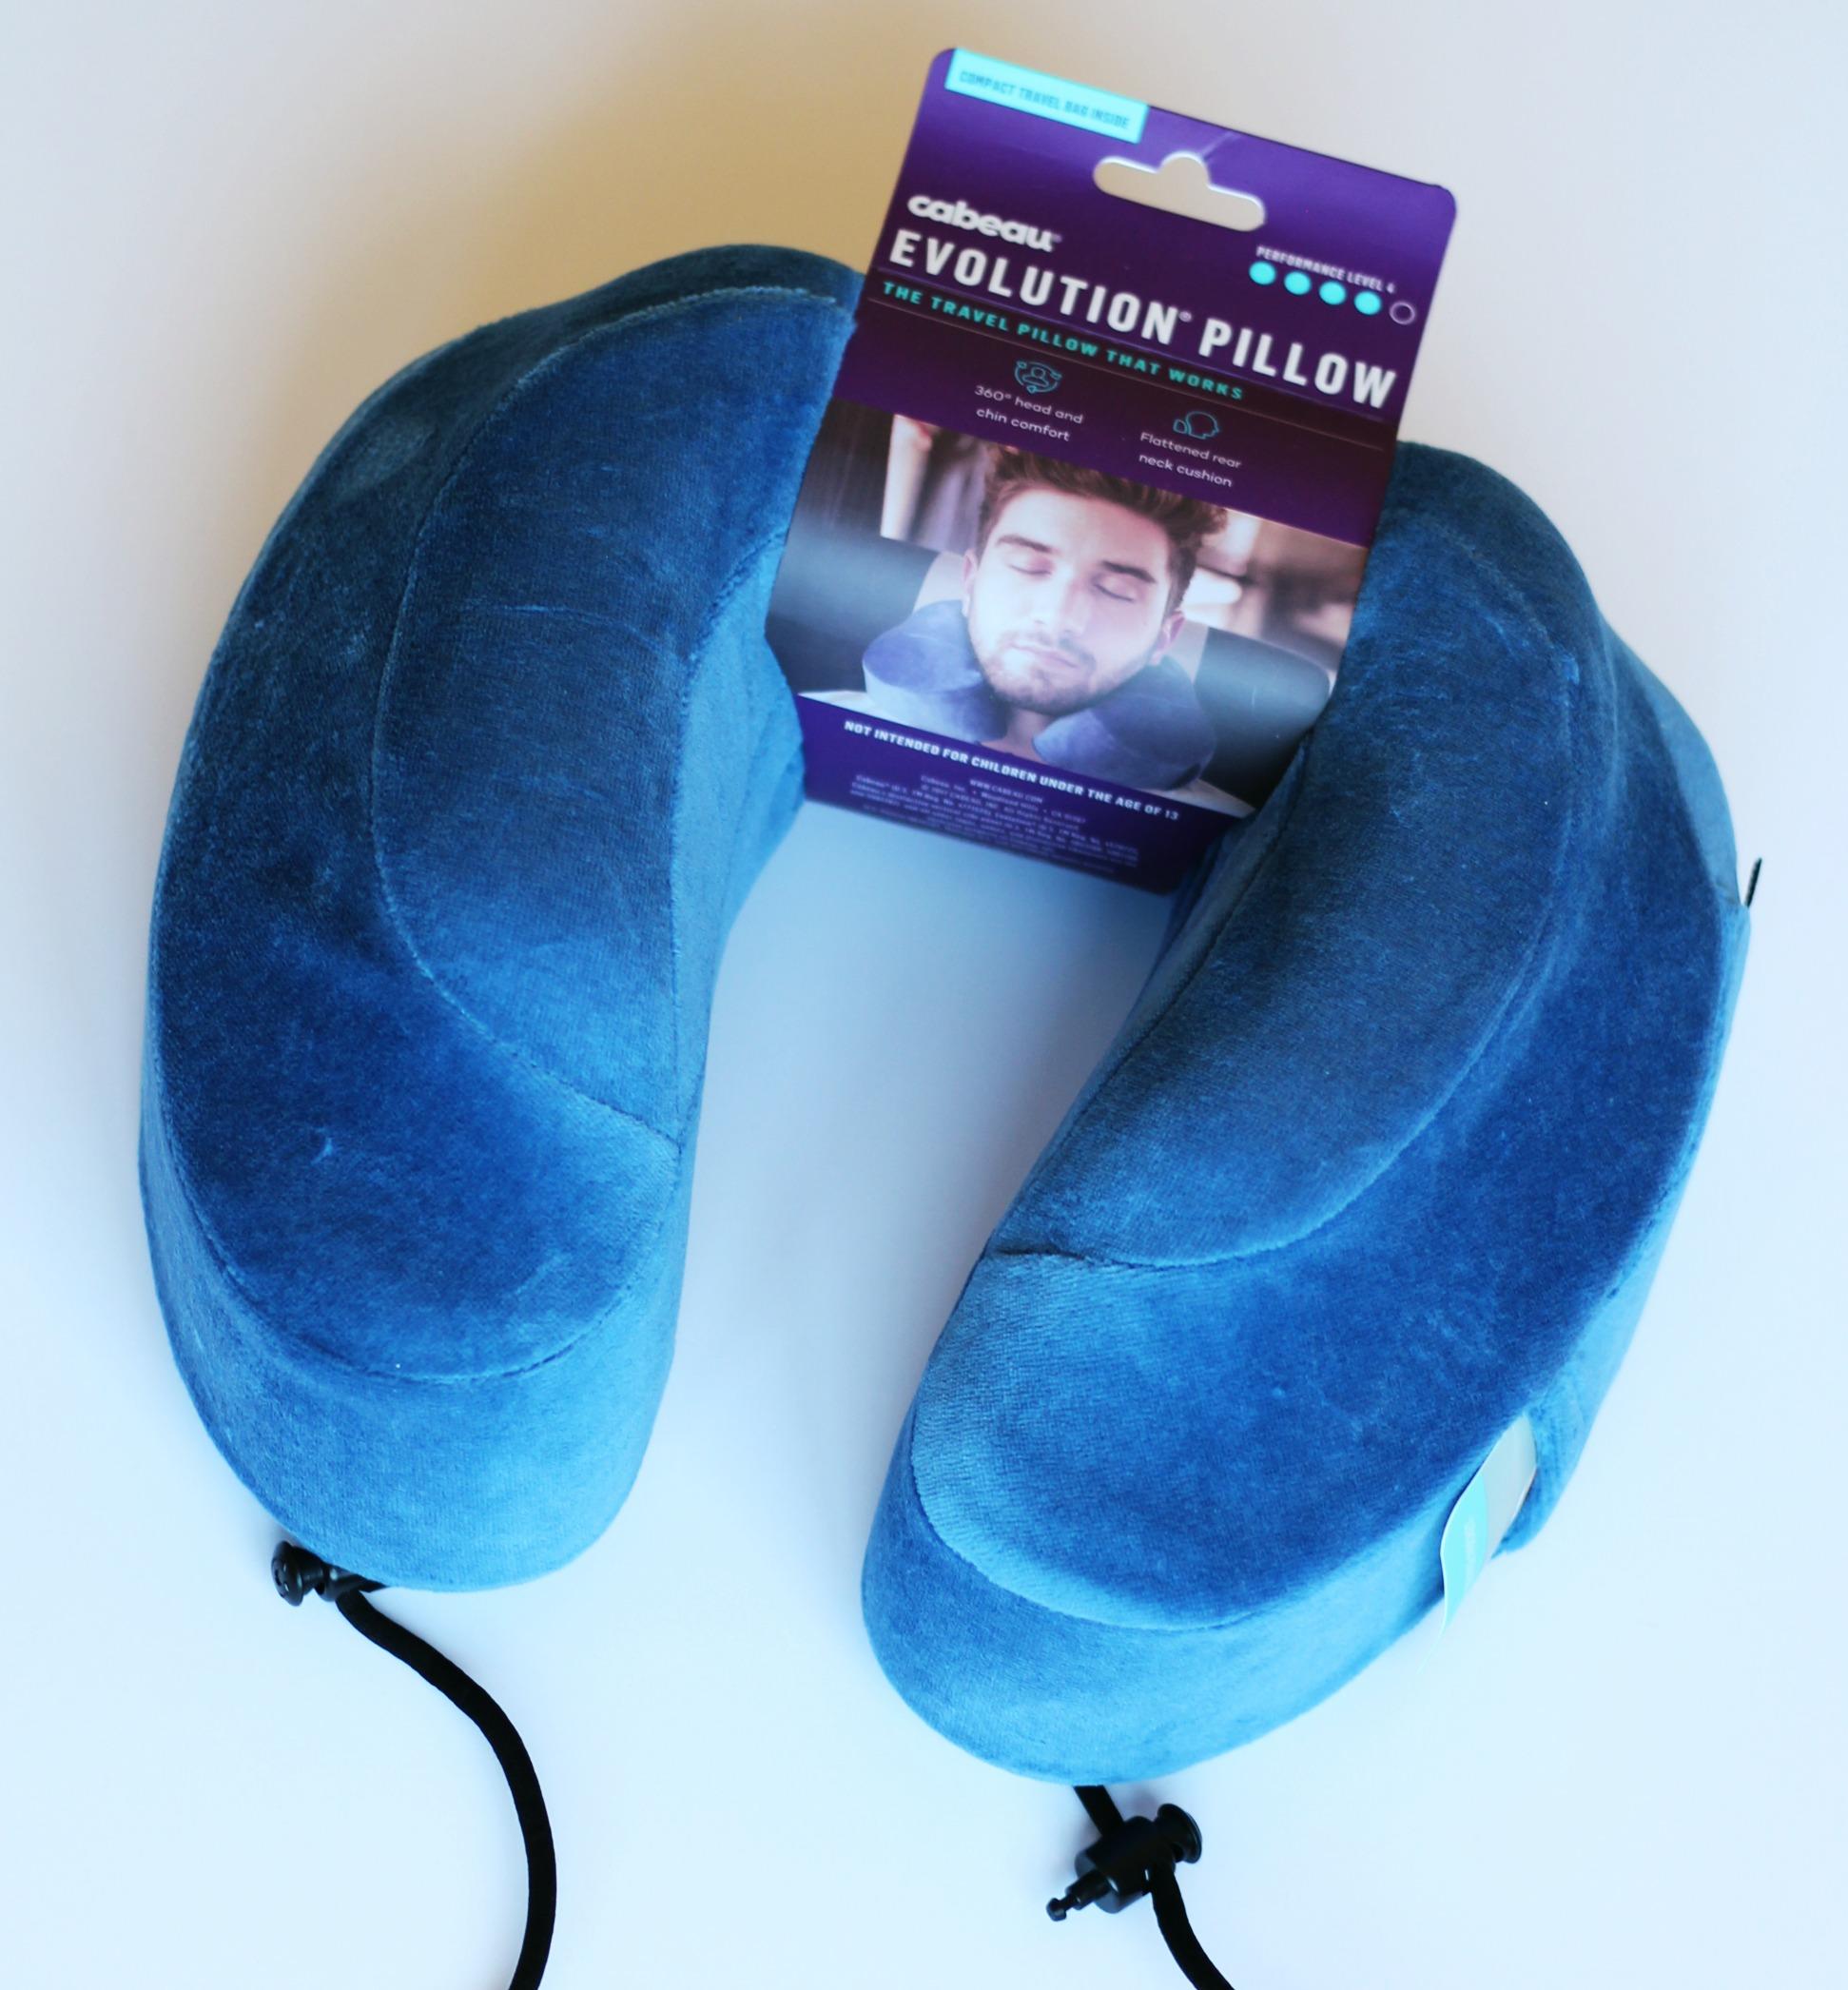 cabeau-evolution-pillow